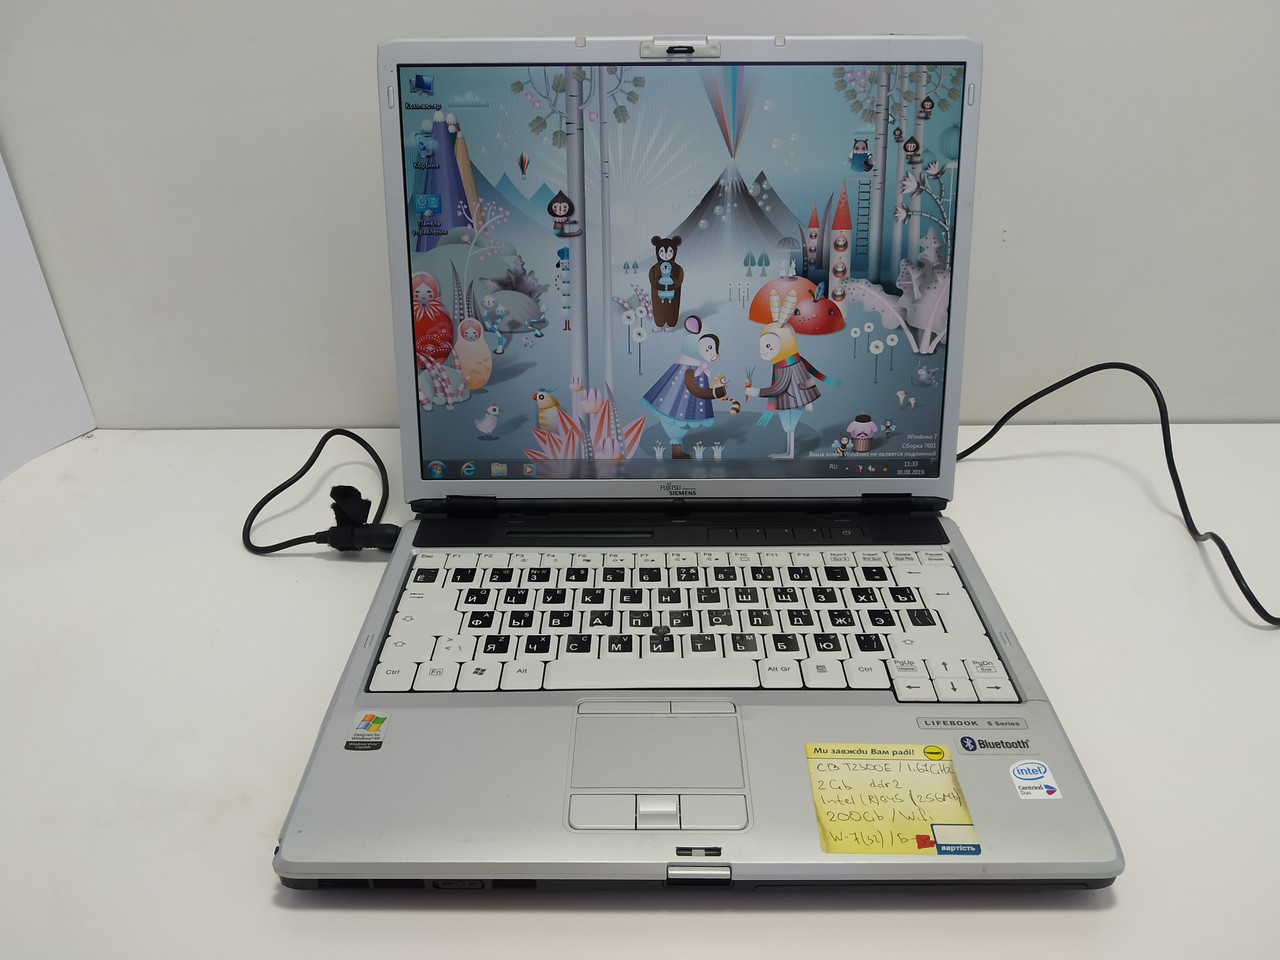 "14"" Fujitsu Siemens Lifebook s7110 \ 2 ядра t2300e 1.66\ 2 ГБ \ 160 ГБ\ Полностью настроен"